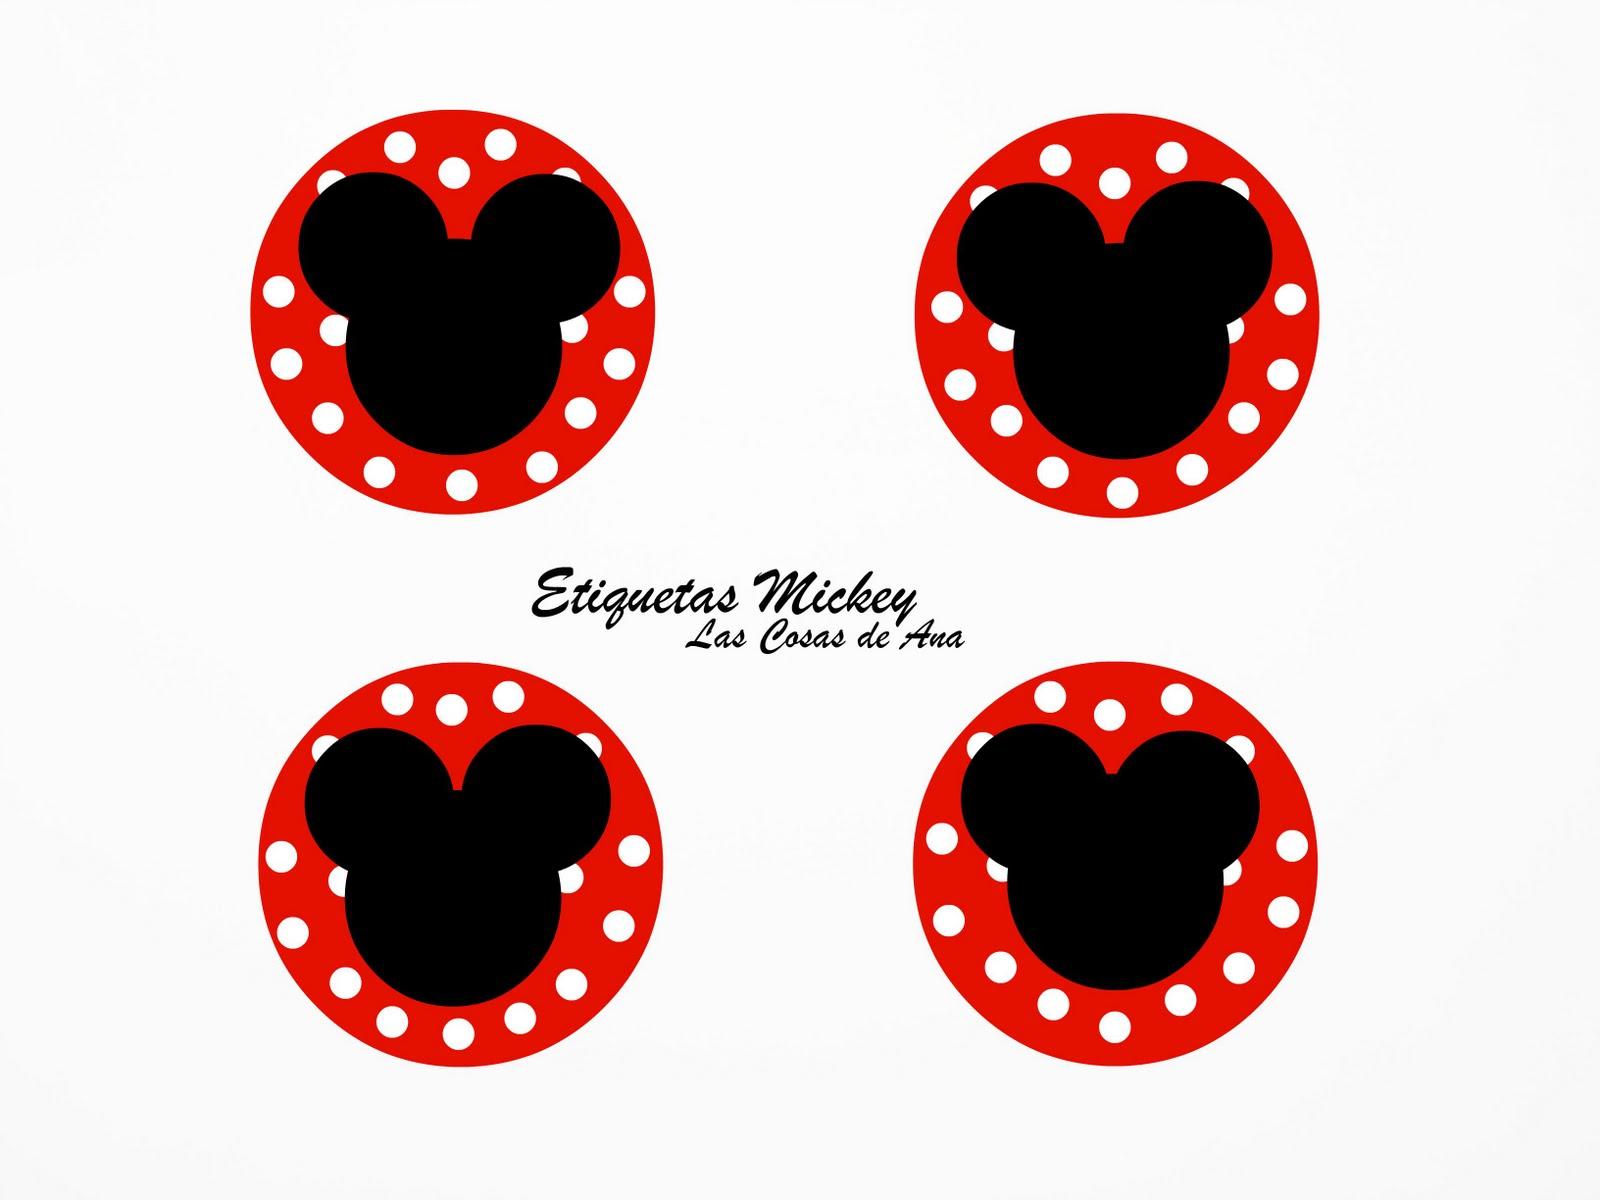 Molde Para Imprimir De La Cara De Minnie Mouse Minnie Classy World